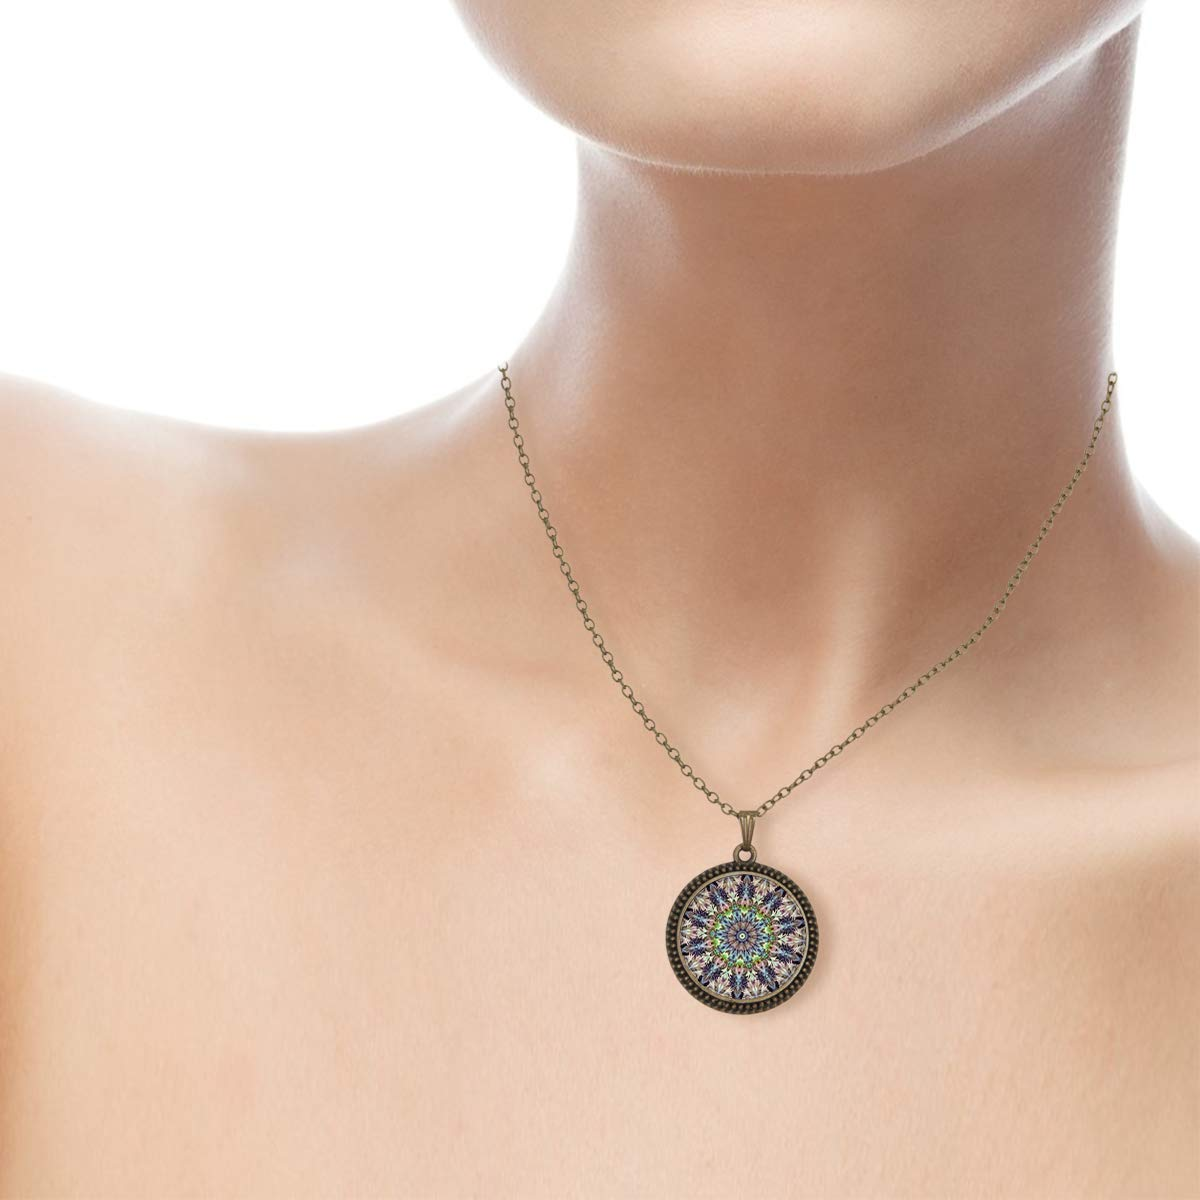 Lightrain Kaleidoscope Buddhism Mandala Pendant Necklace Vintage Bronze Chain Statement Necklace Handmade Jewelry Gifts